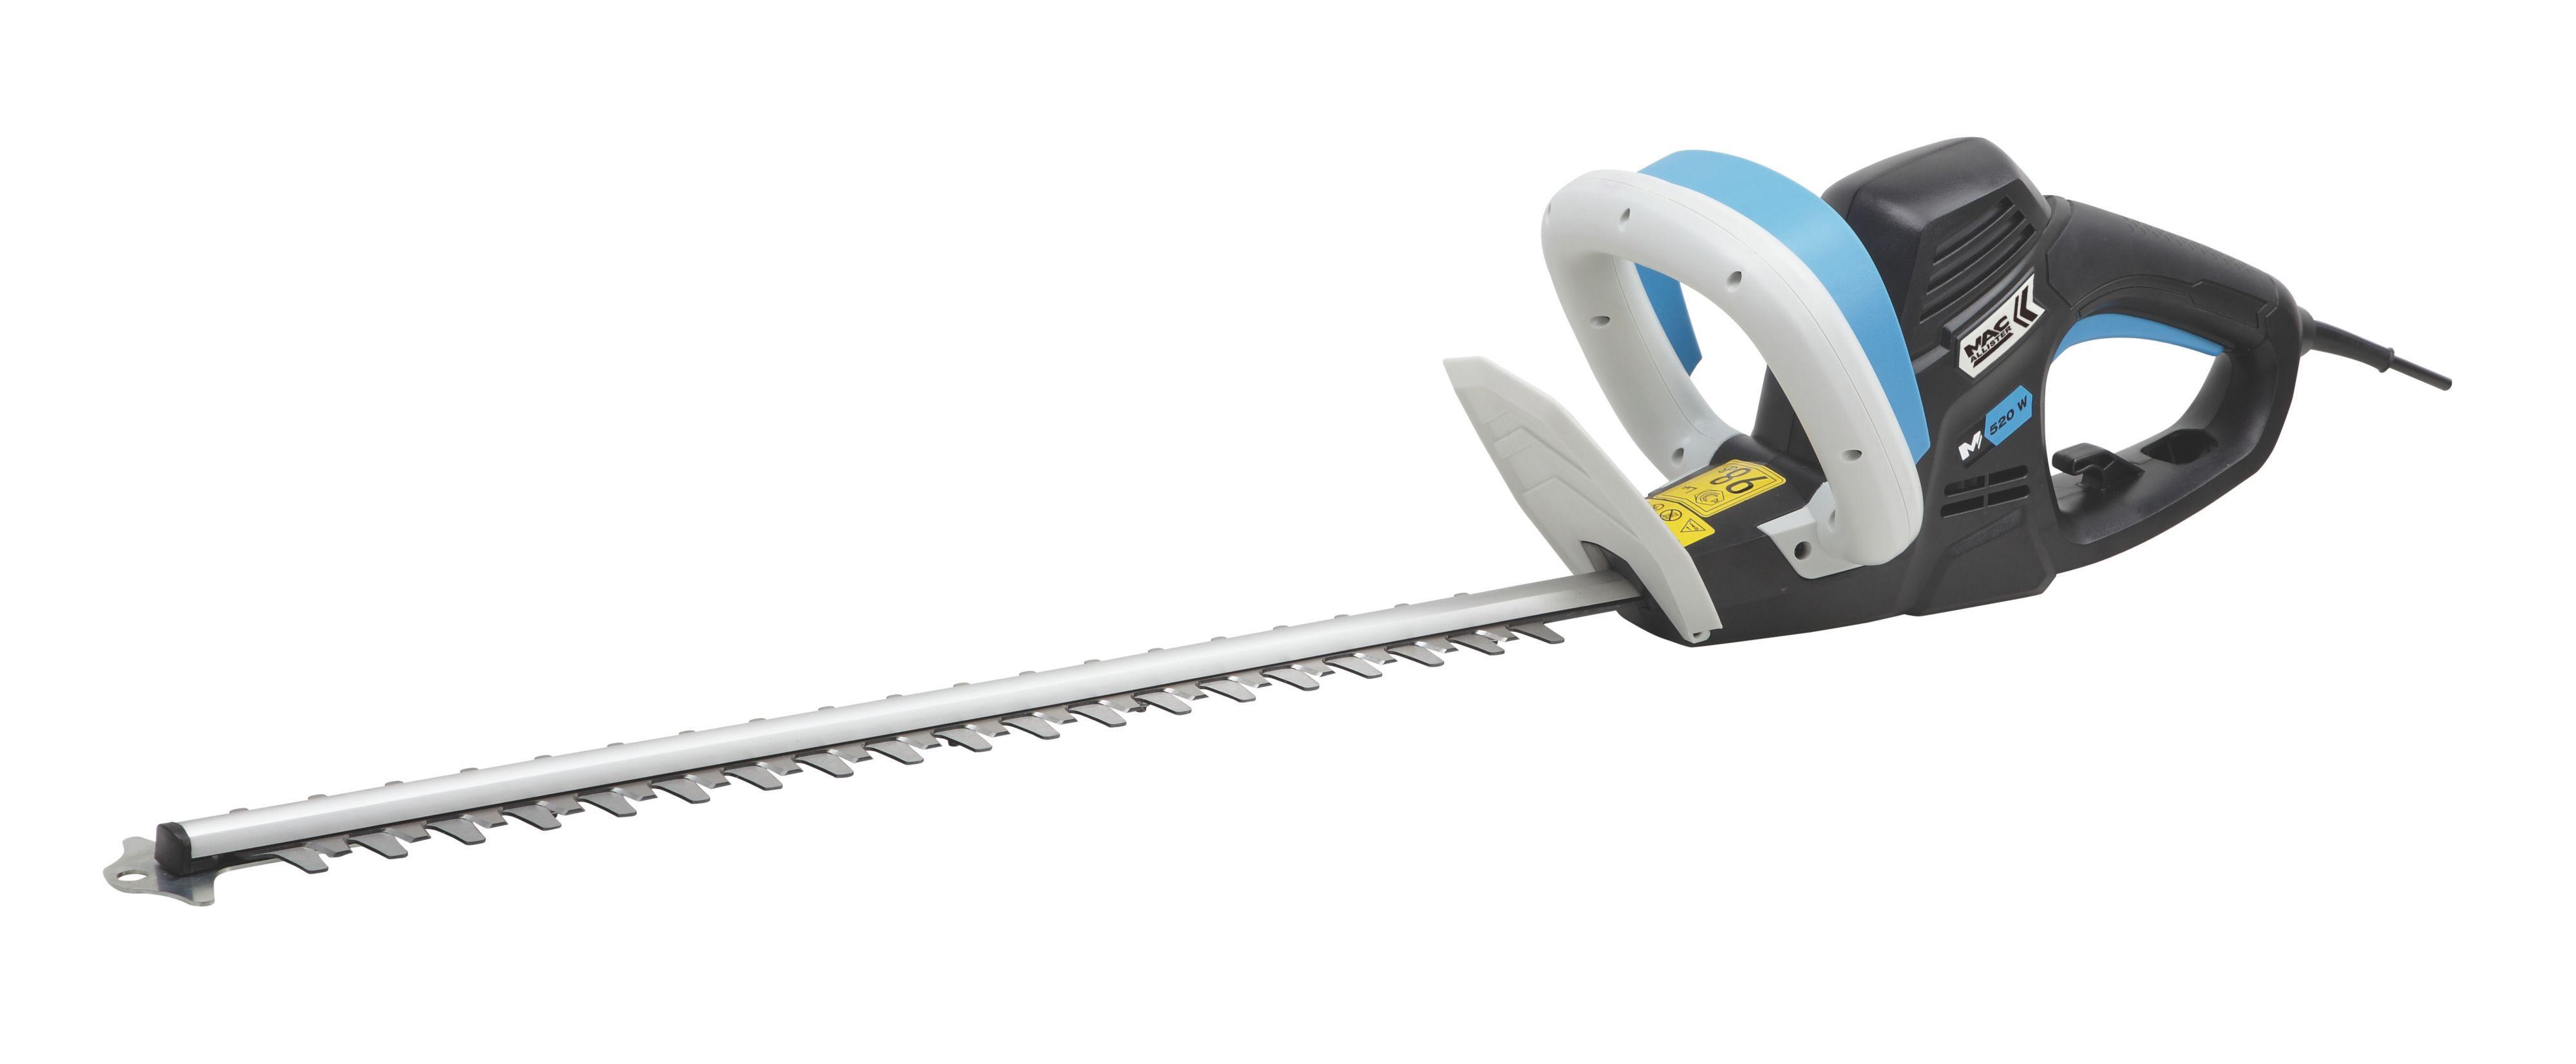 Mac Allister Easycut Mhtp520 Electric Corded Hedge Trimmer